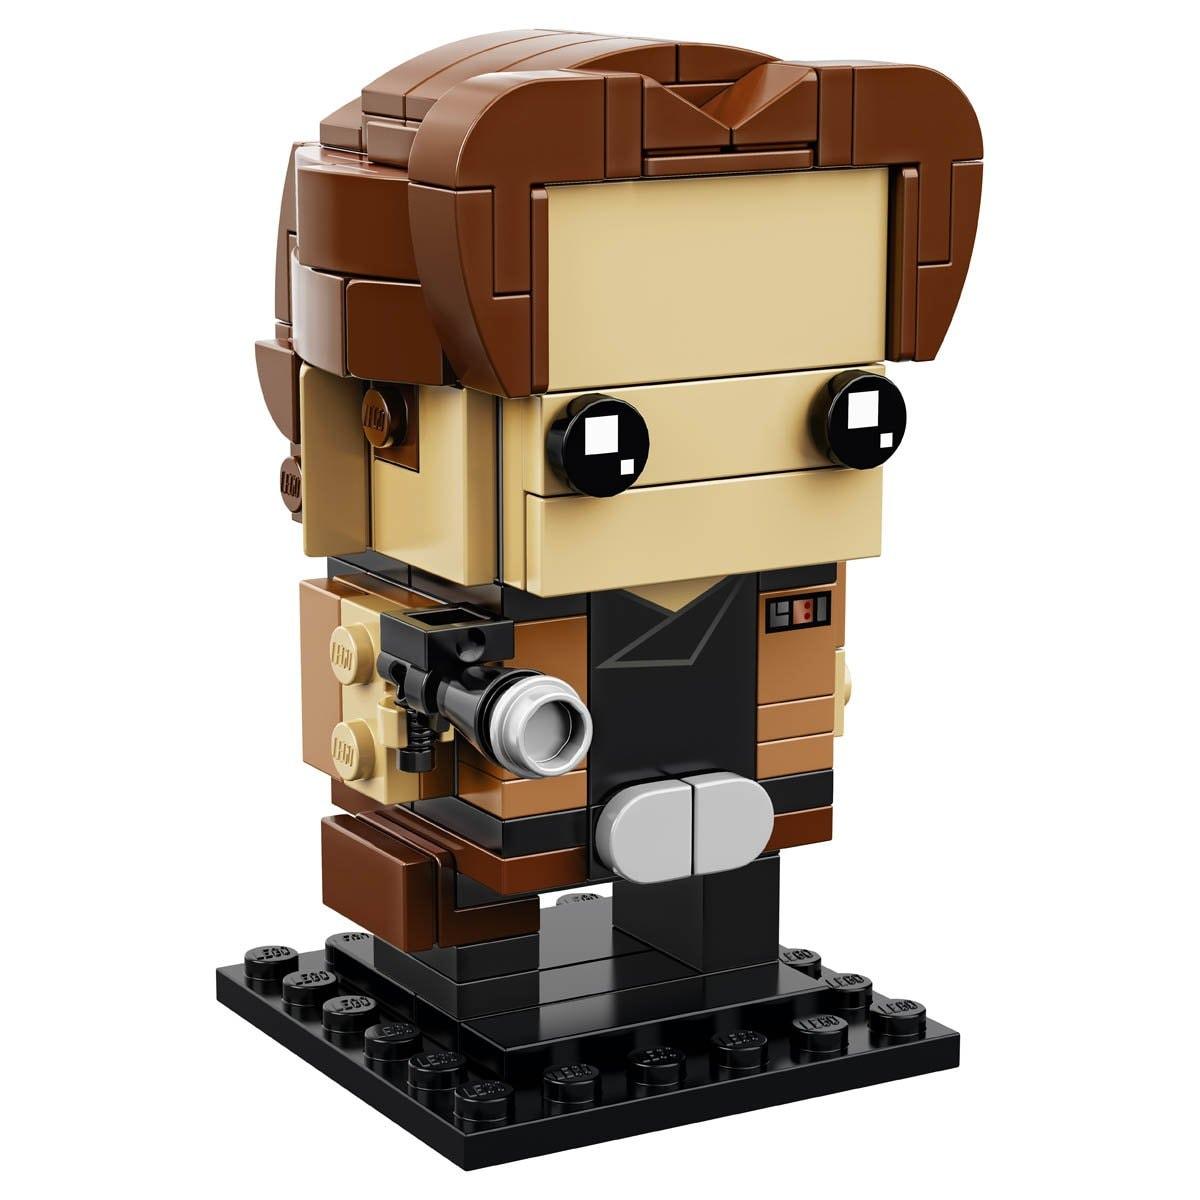 Brickheadz Han Solo Star Wars Lego